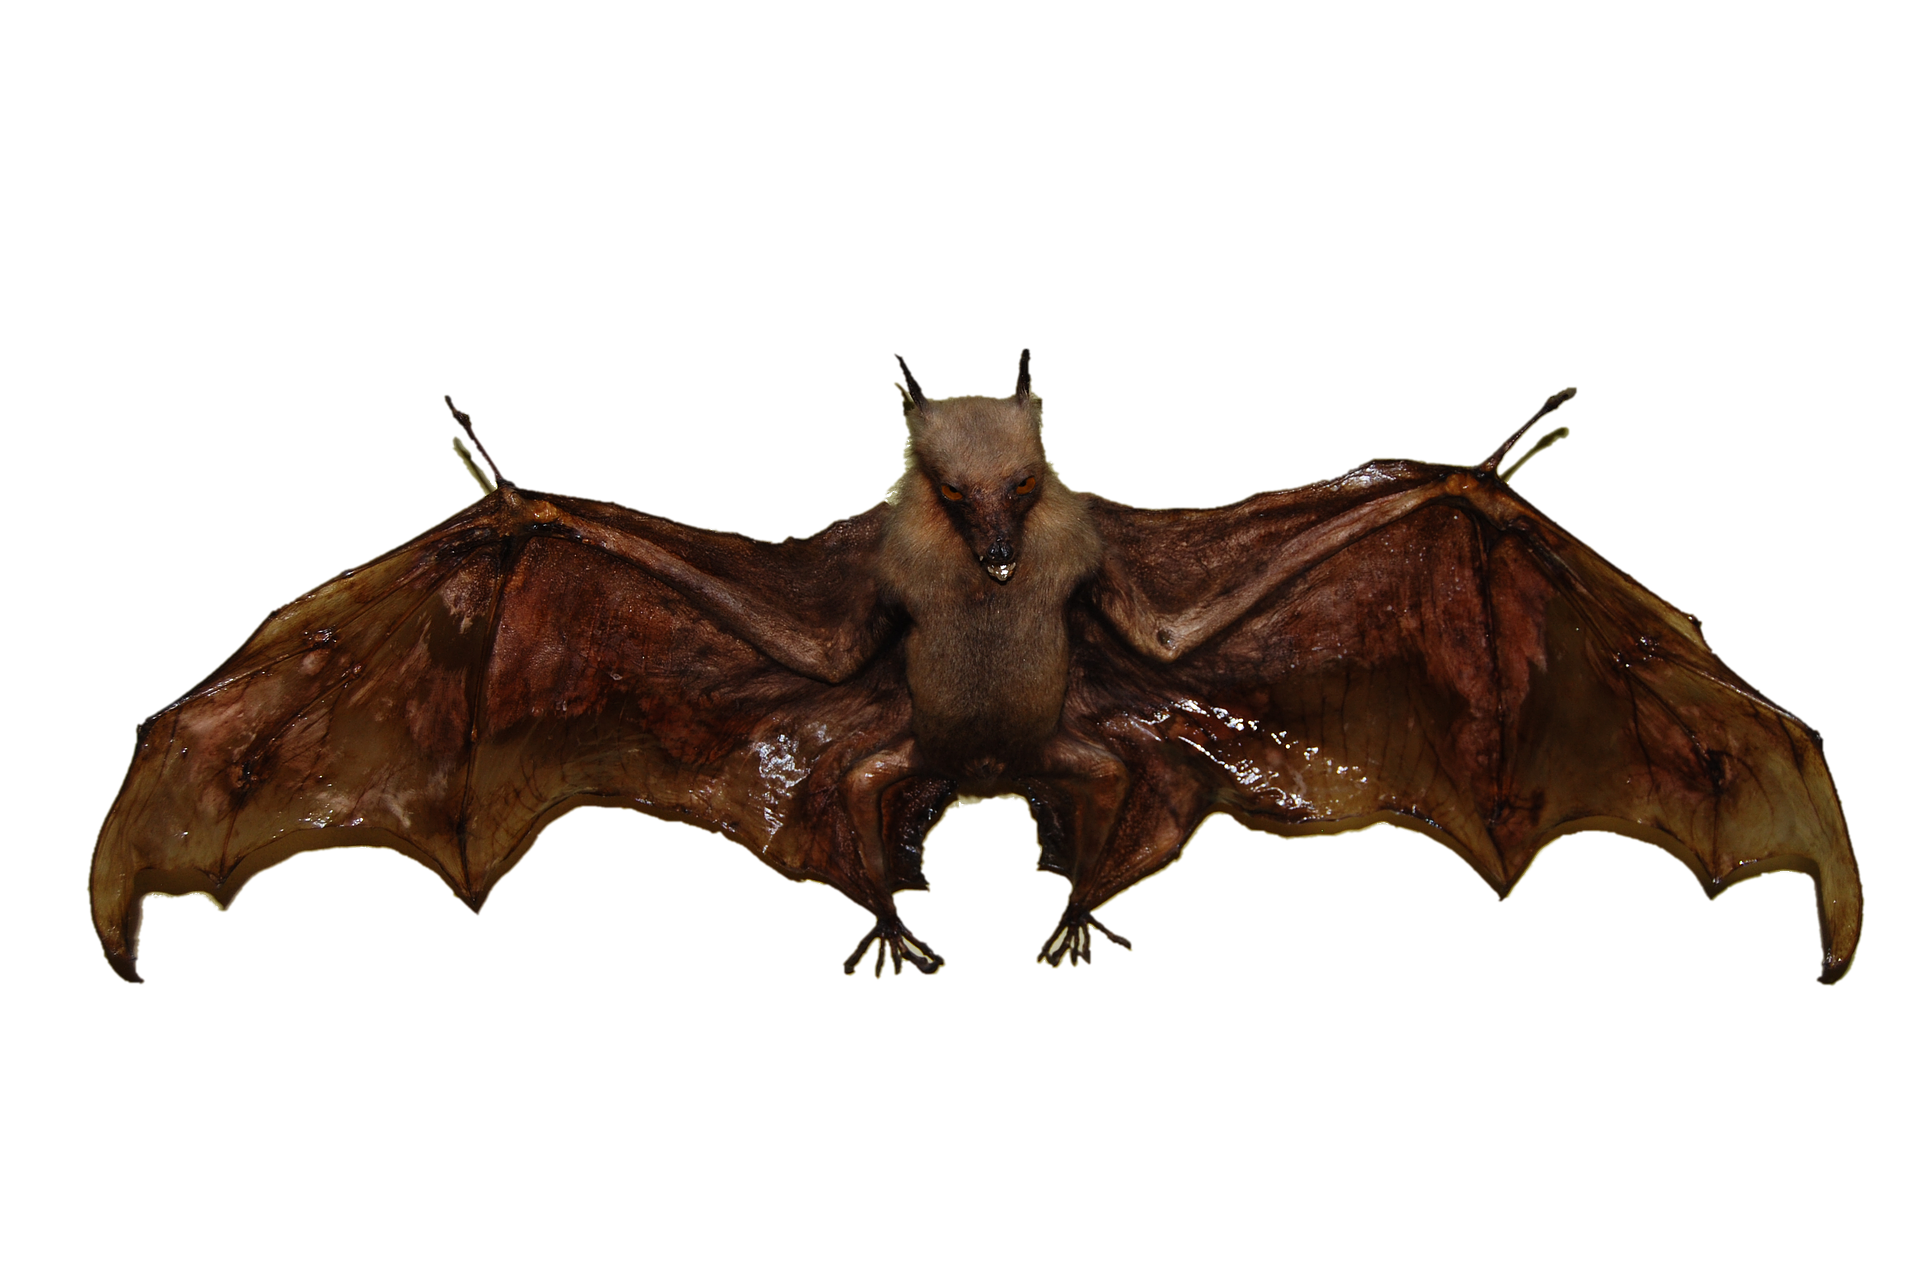 bat- 10 interesting facts about bats